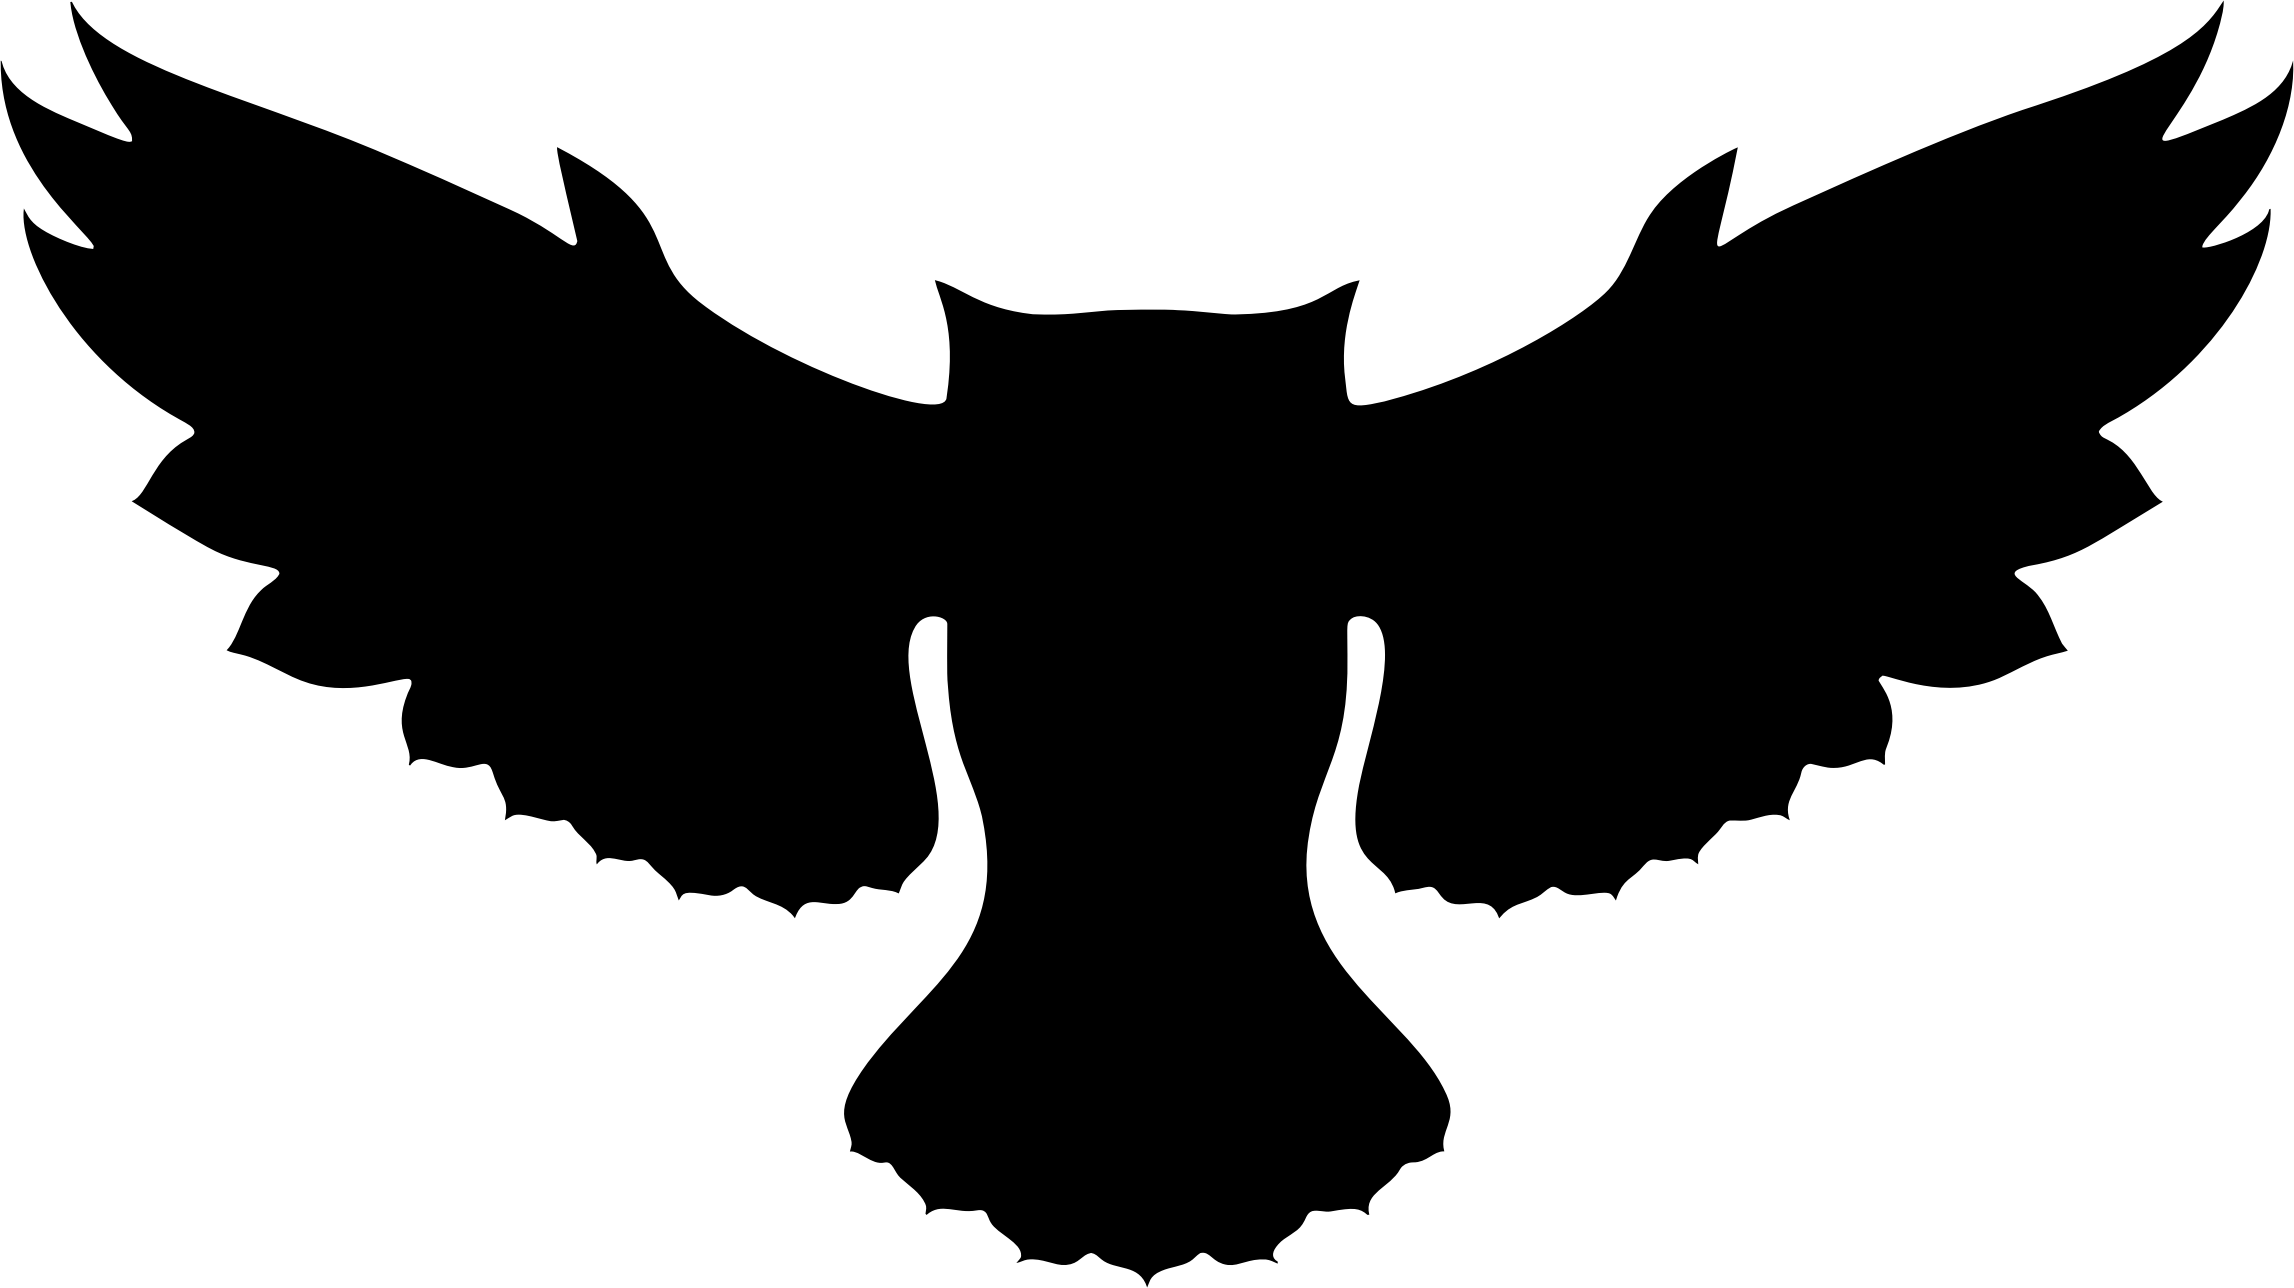 2294x1288 Clipart